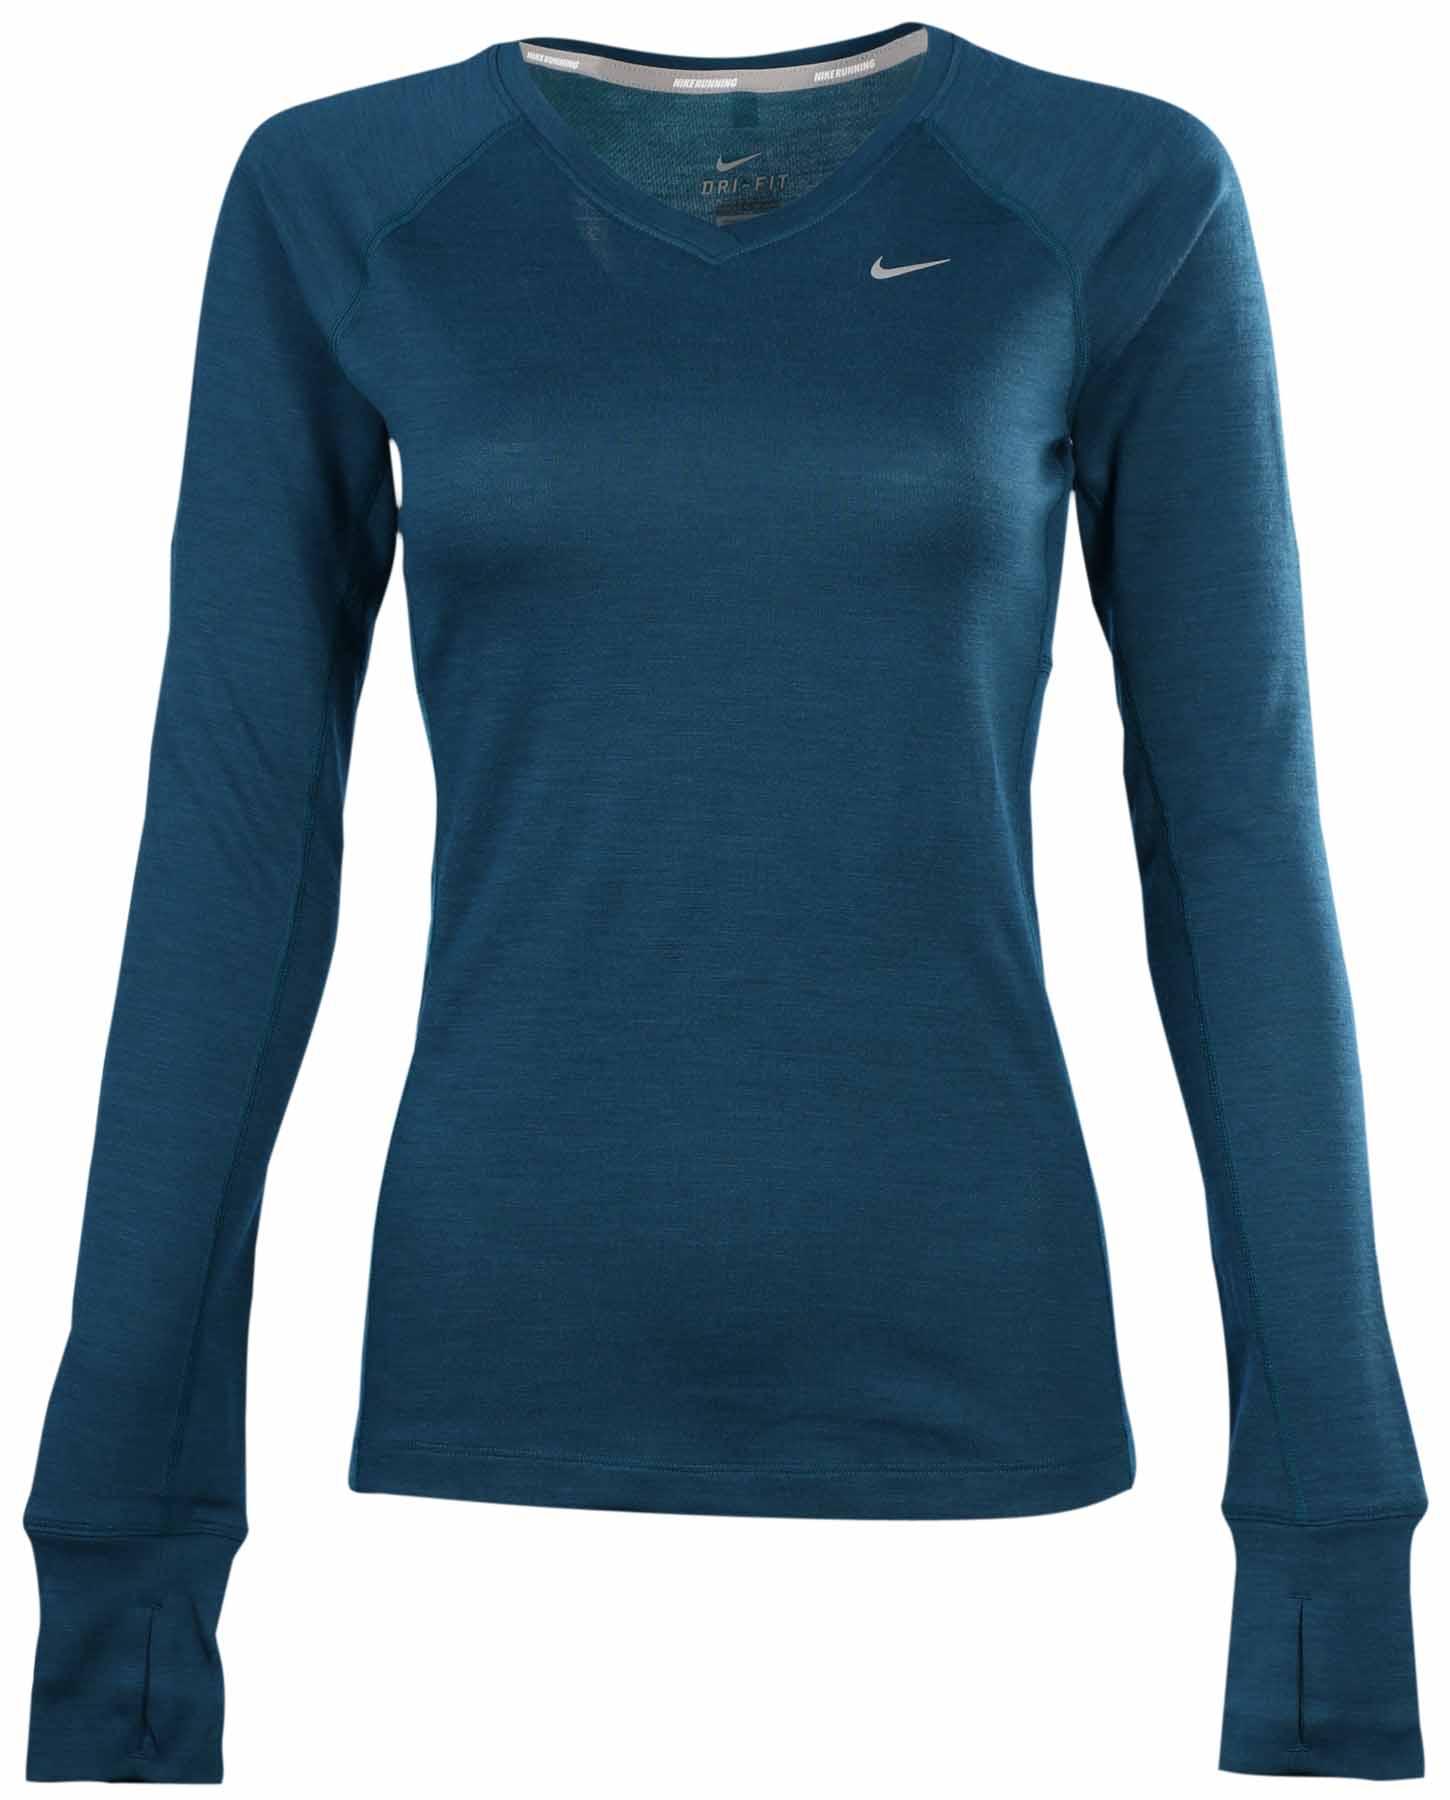 Nike Women's Dri-Fit Wool V-Neck Running Shirt-Silver   eBay